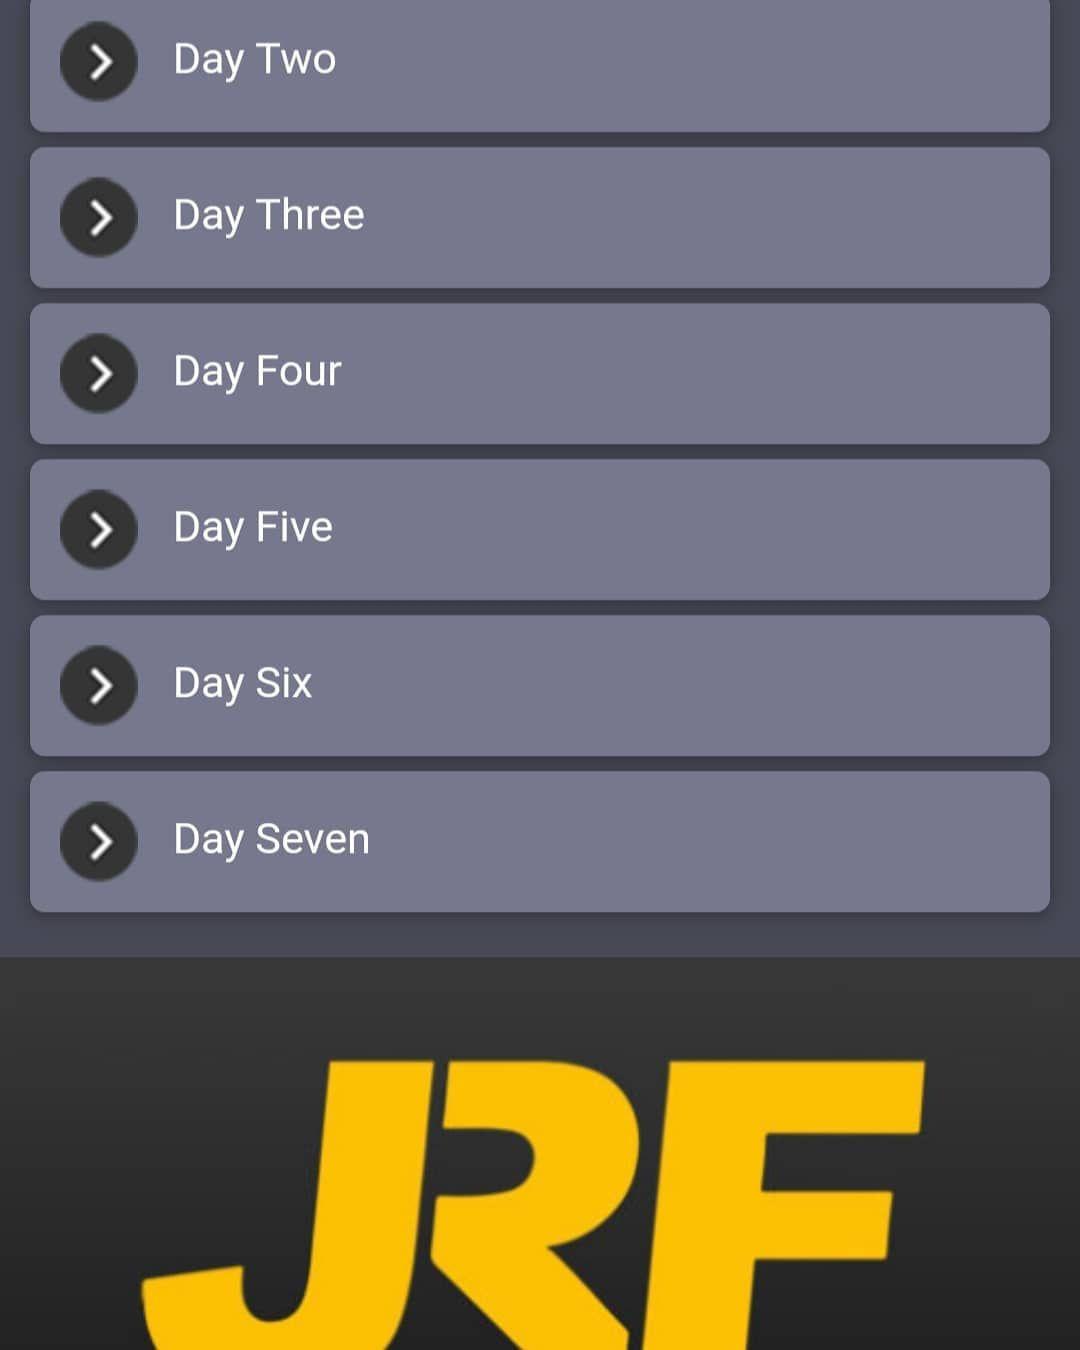 So excited to start the JRF keto plan!!! #Keto #HealthJourney #Fitness #ItsALifeStyleNotADiet #ThisY...